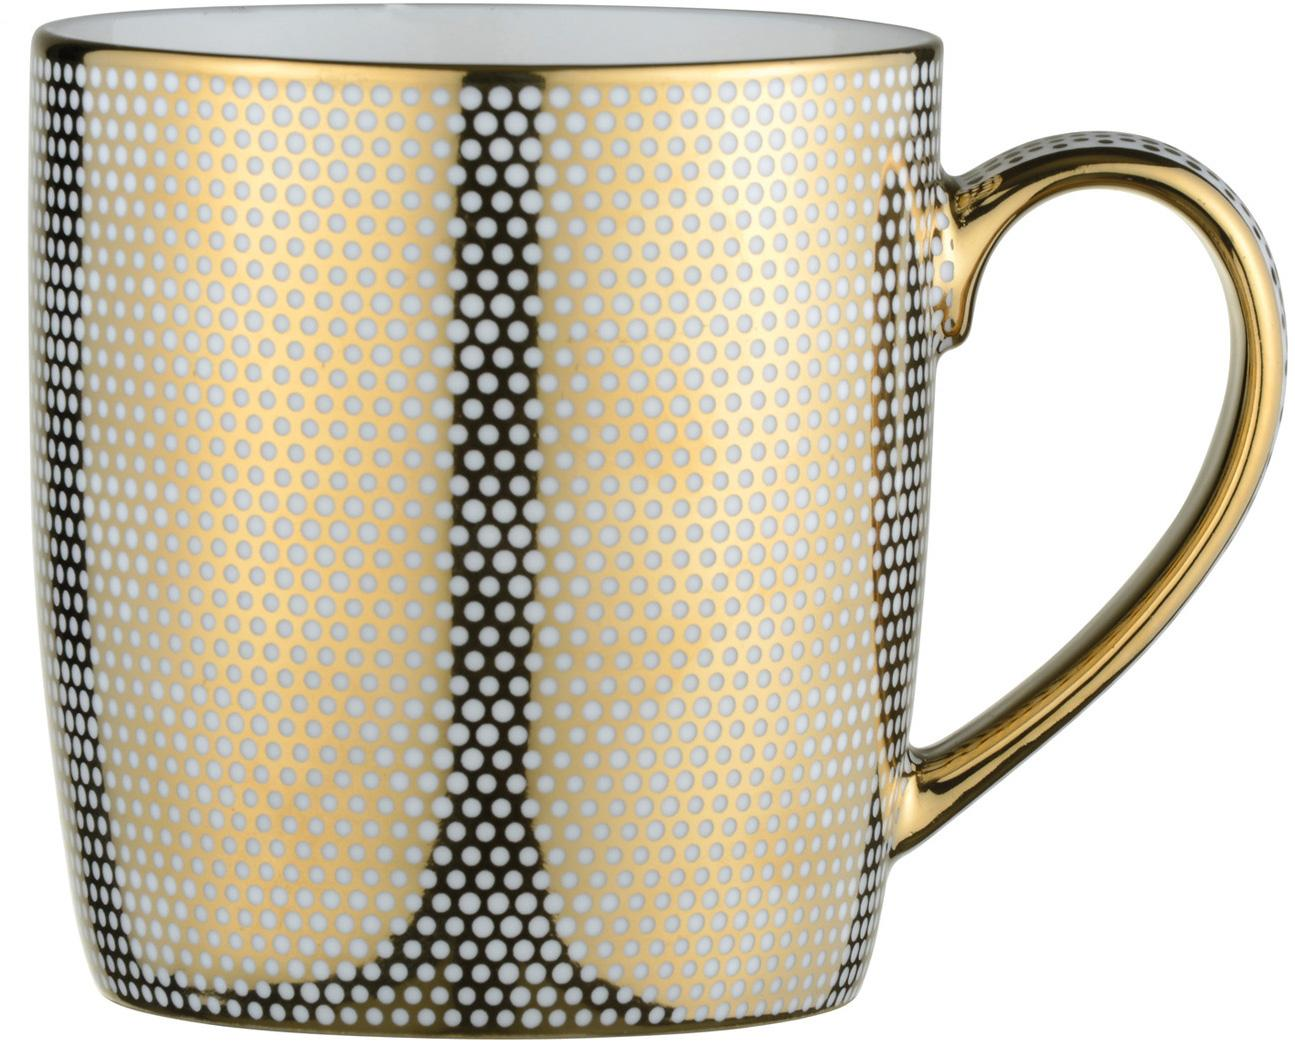 Tassen Dots mit goldenem Dekor, 4 Stück, Porzellan, Weiss, Goldfarben, Ø 9 x H 10 cm